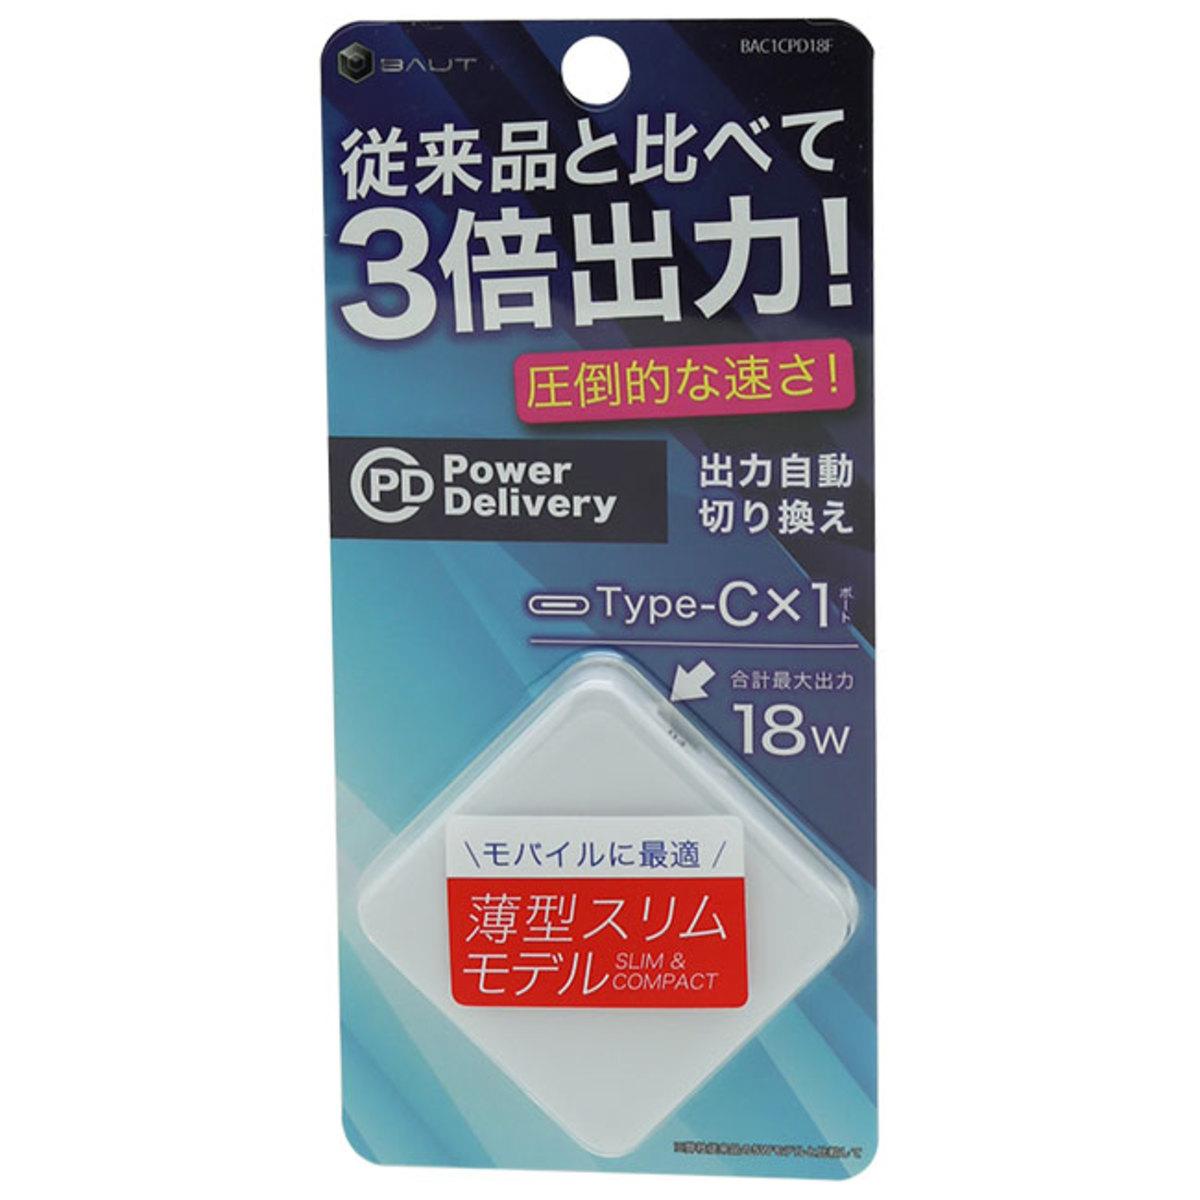 BAC1CPD18FW-1